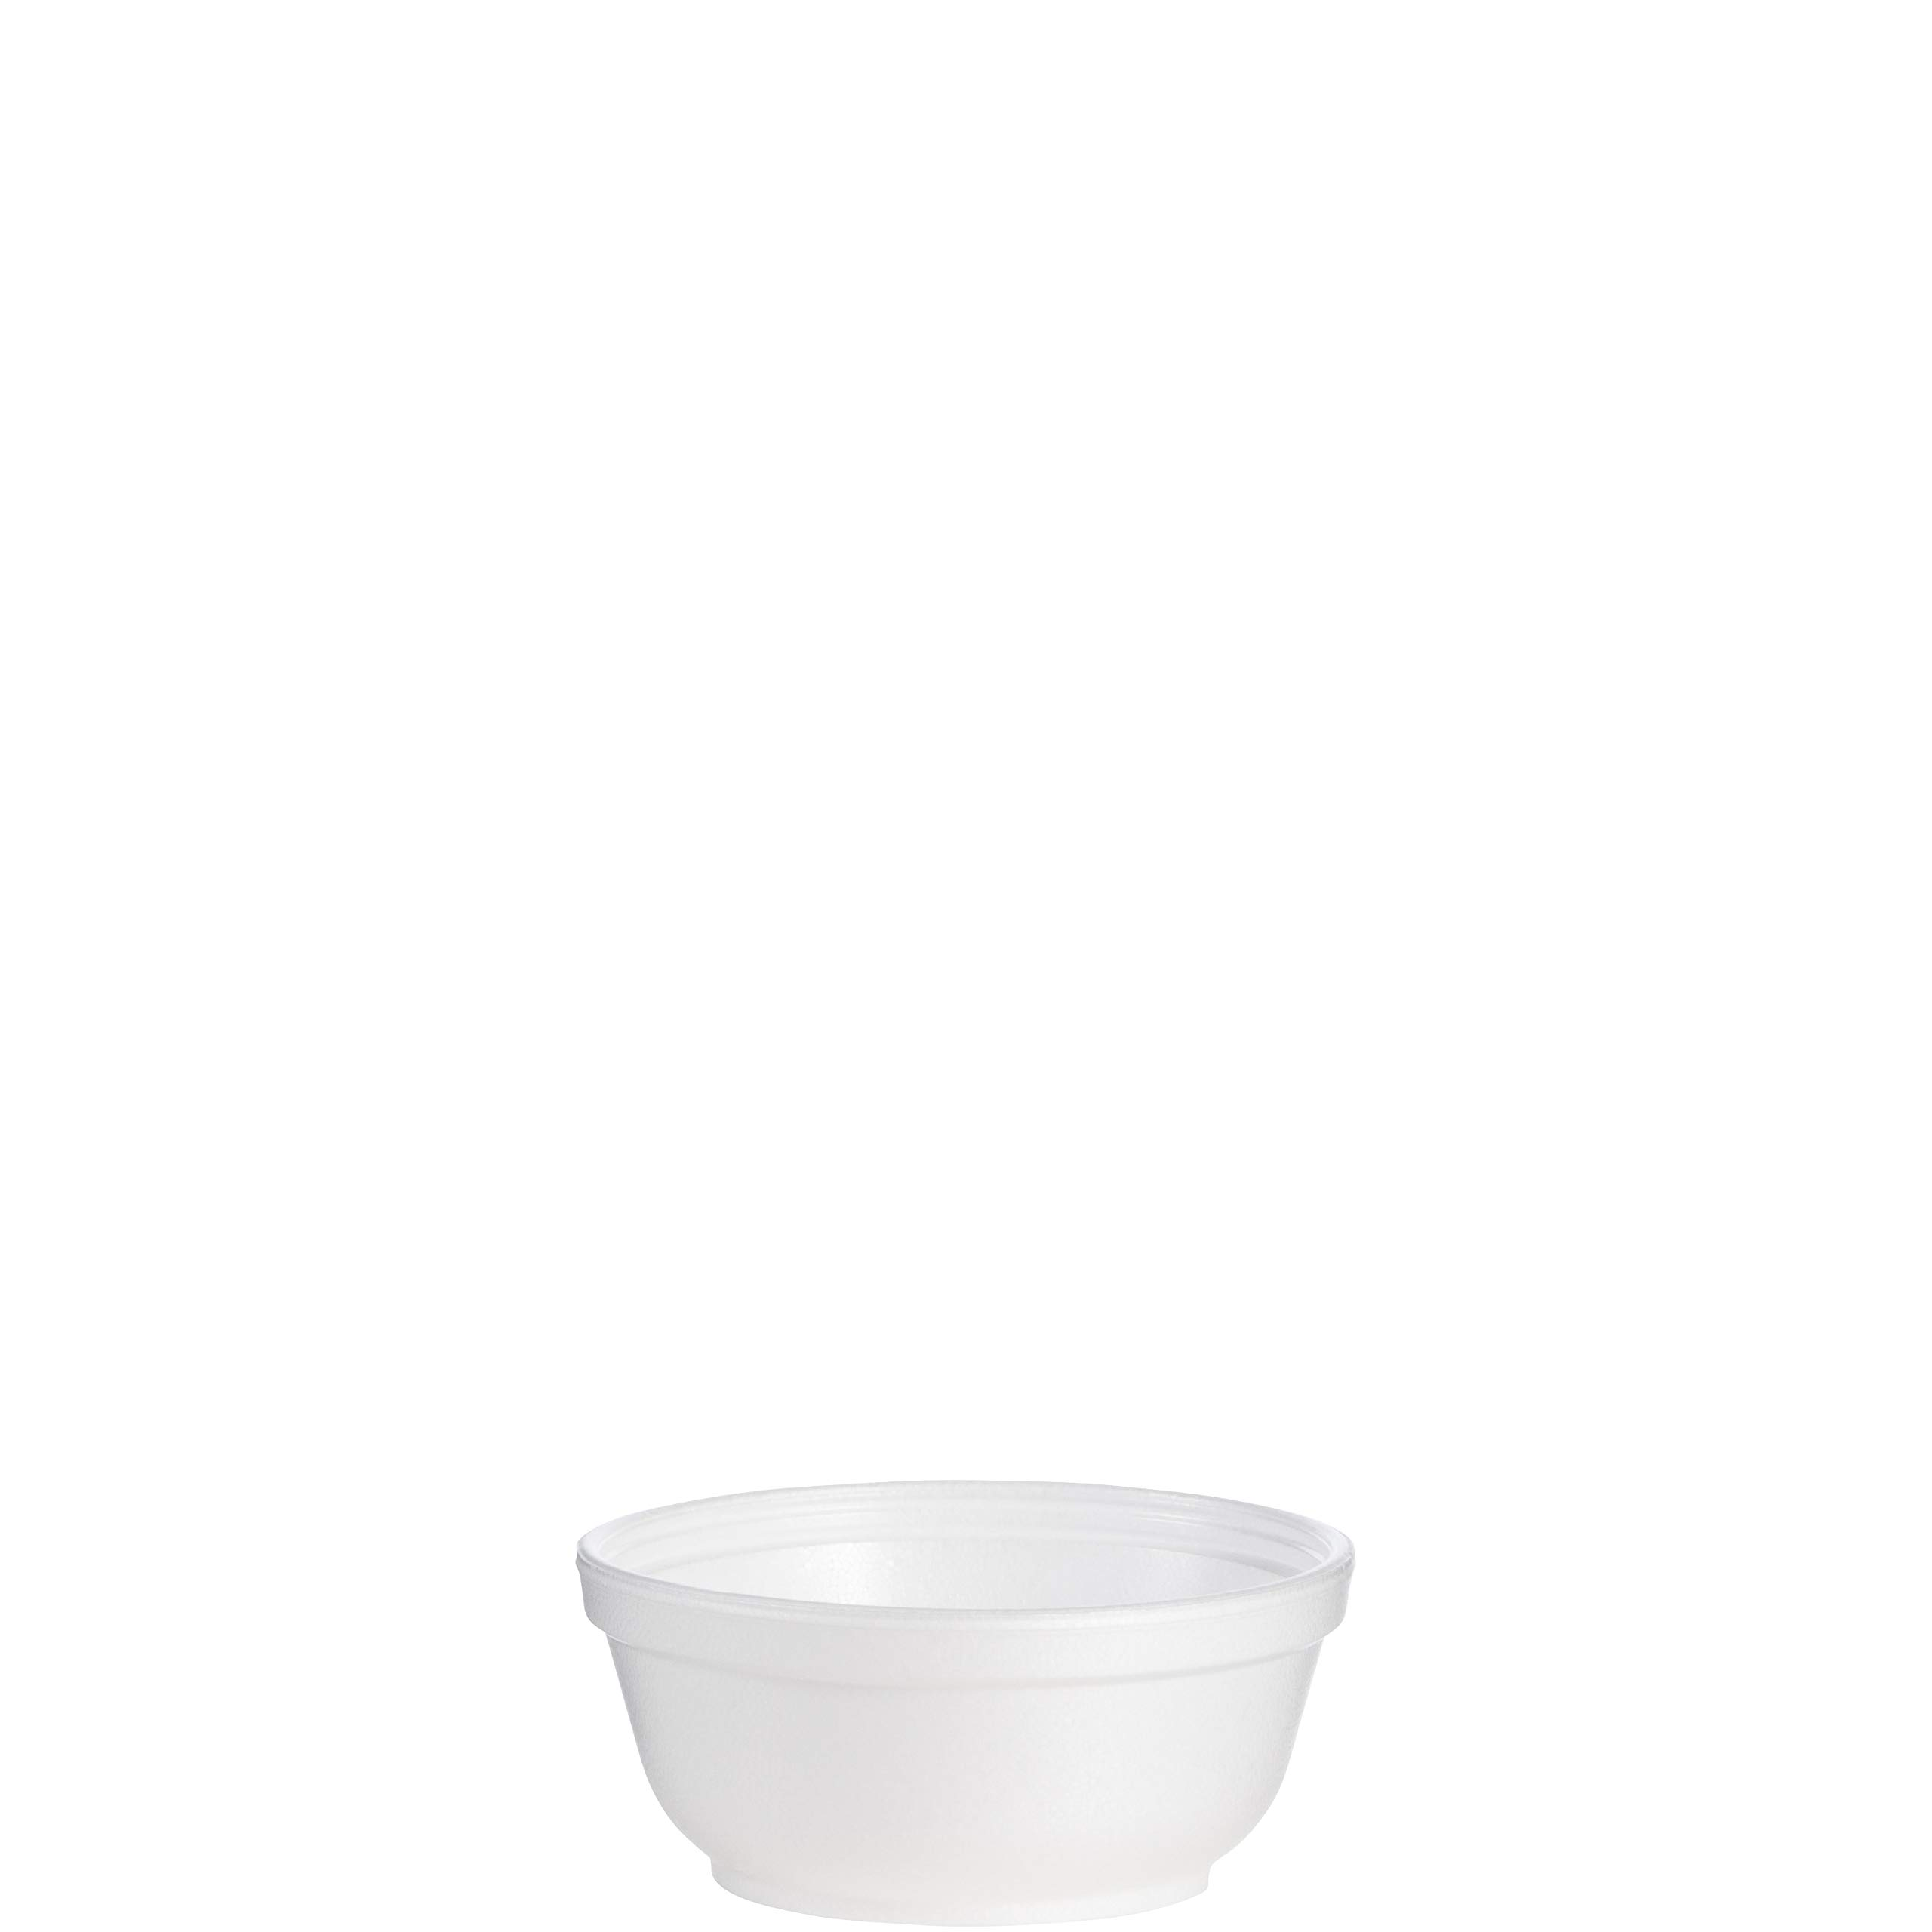 Dart 8B20 8 oz Foam Bowl (Case of 1000)